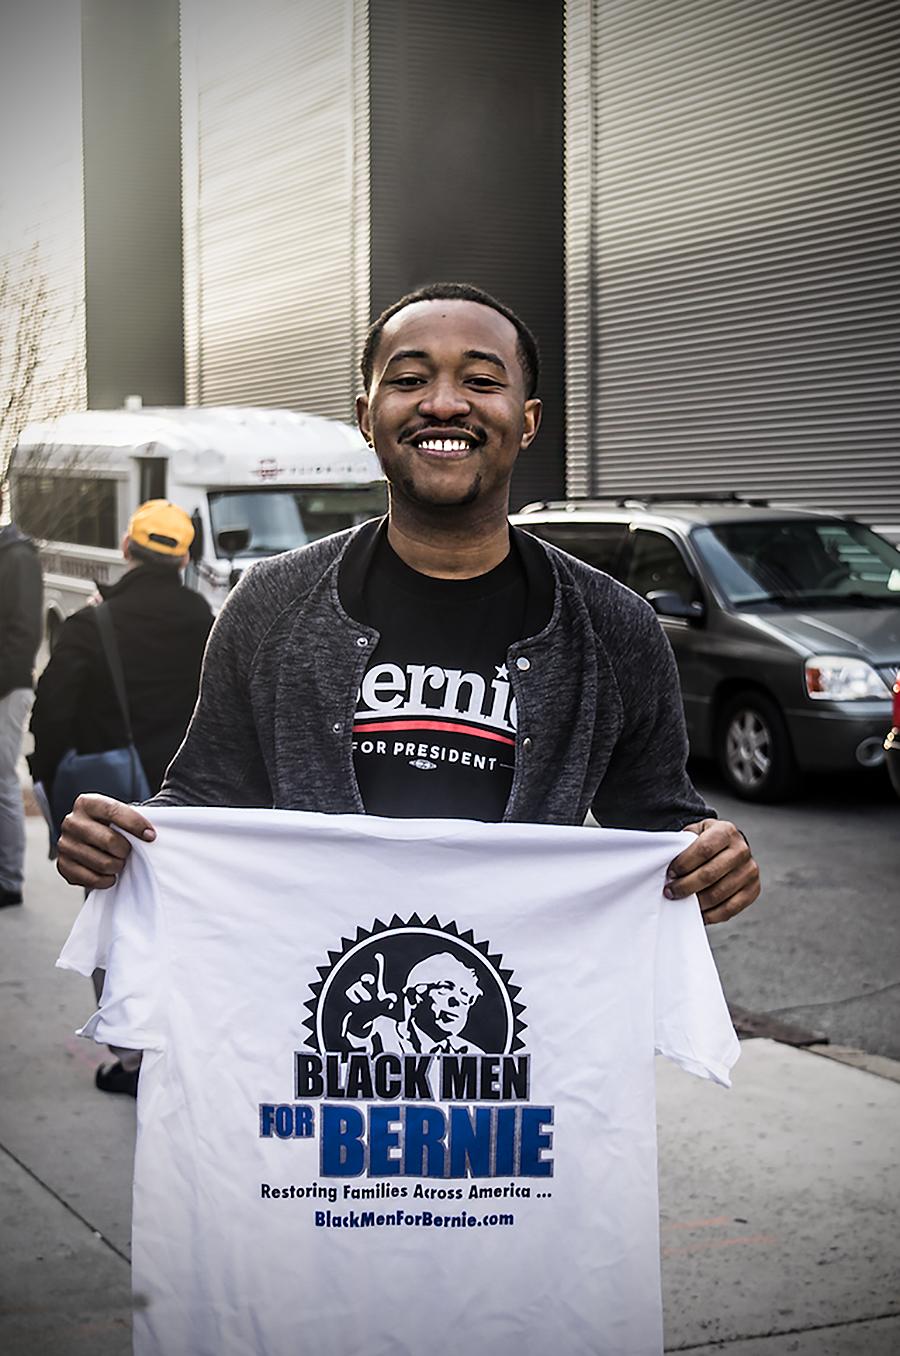 Leniqueca_Welcome_Bernie_Sanders_Rally_Blackmen_ tshirts_Supporter_Elections2016_Presedential_Philadelphia